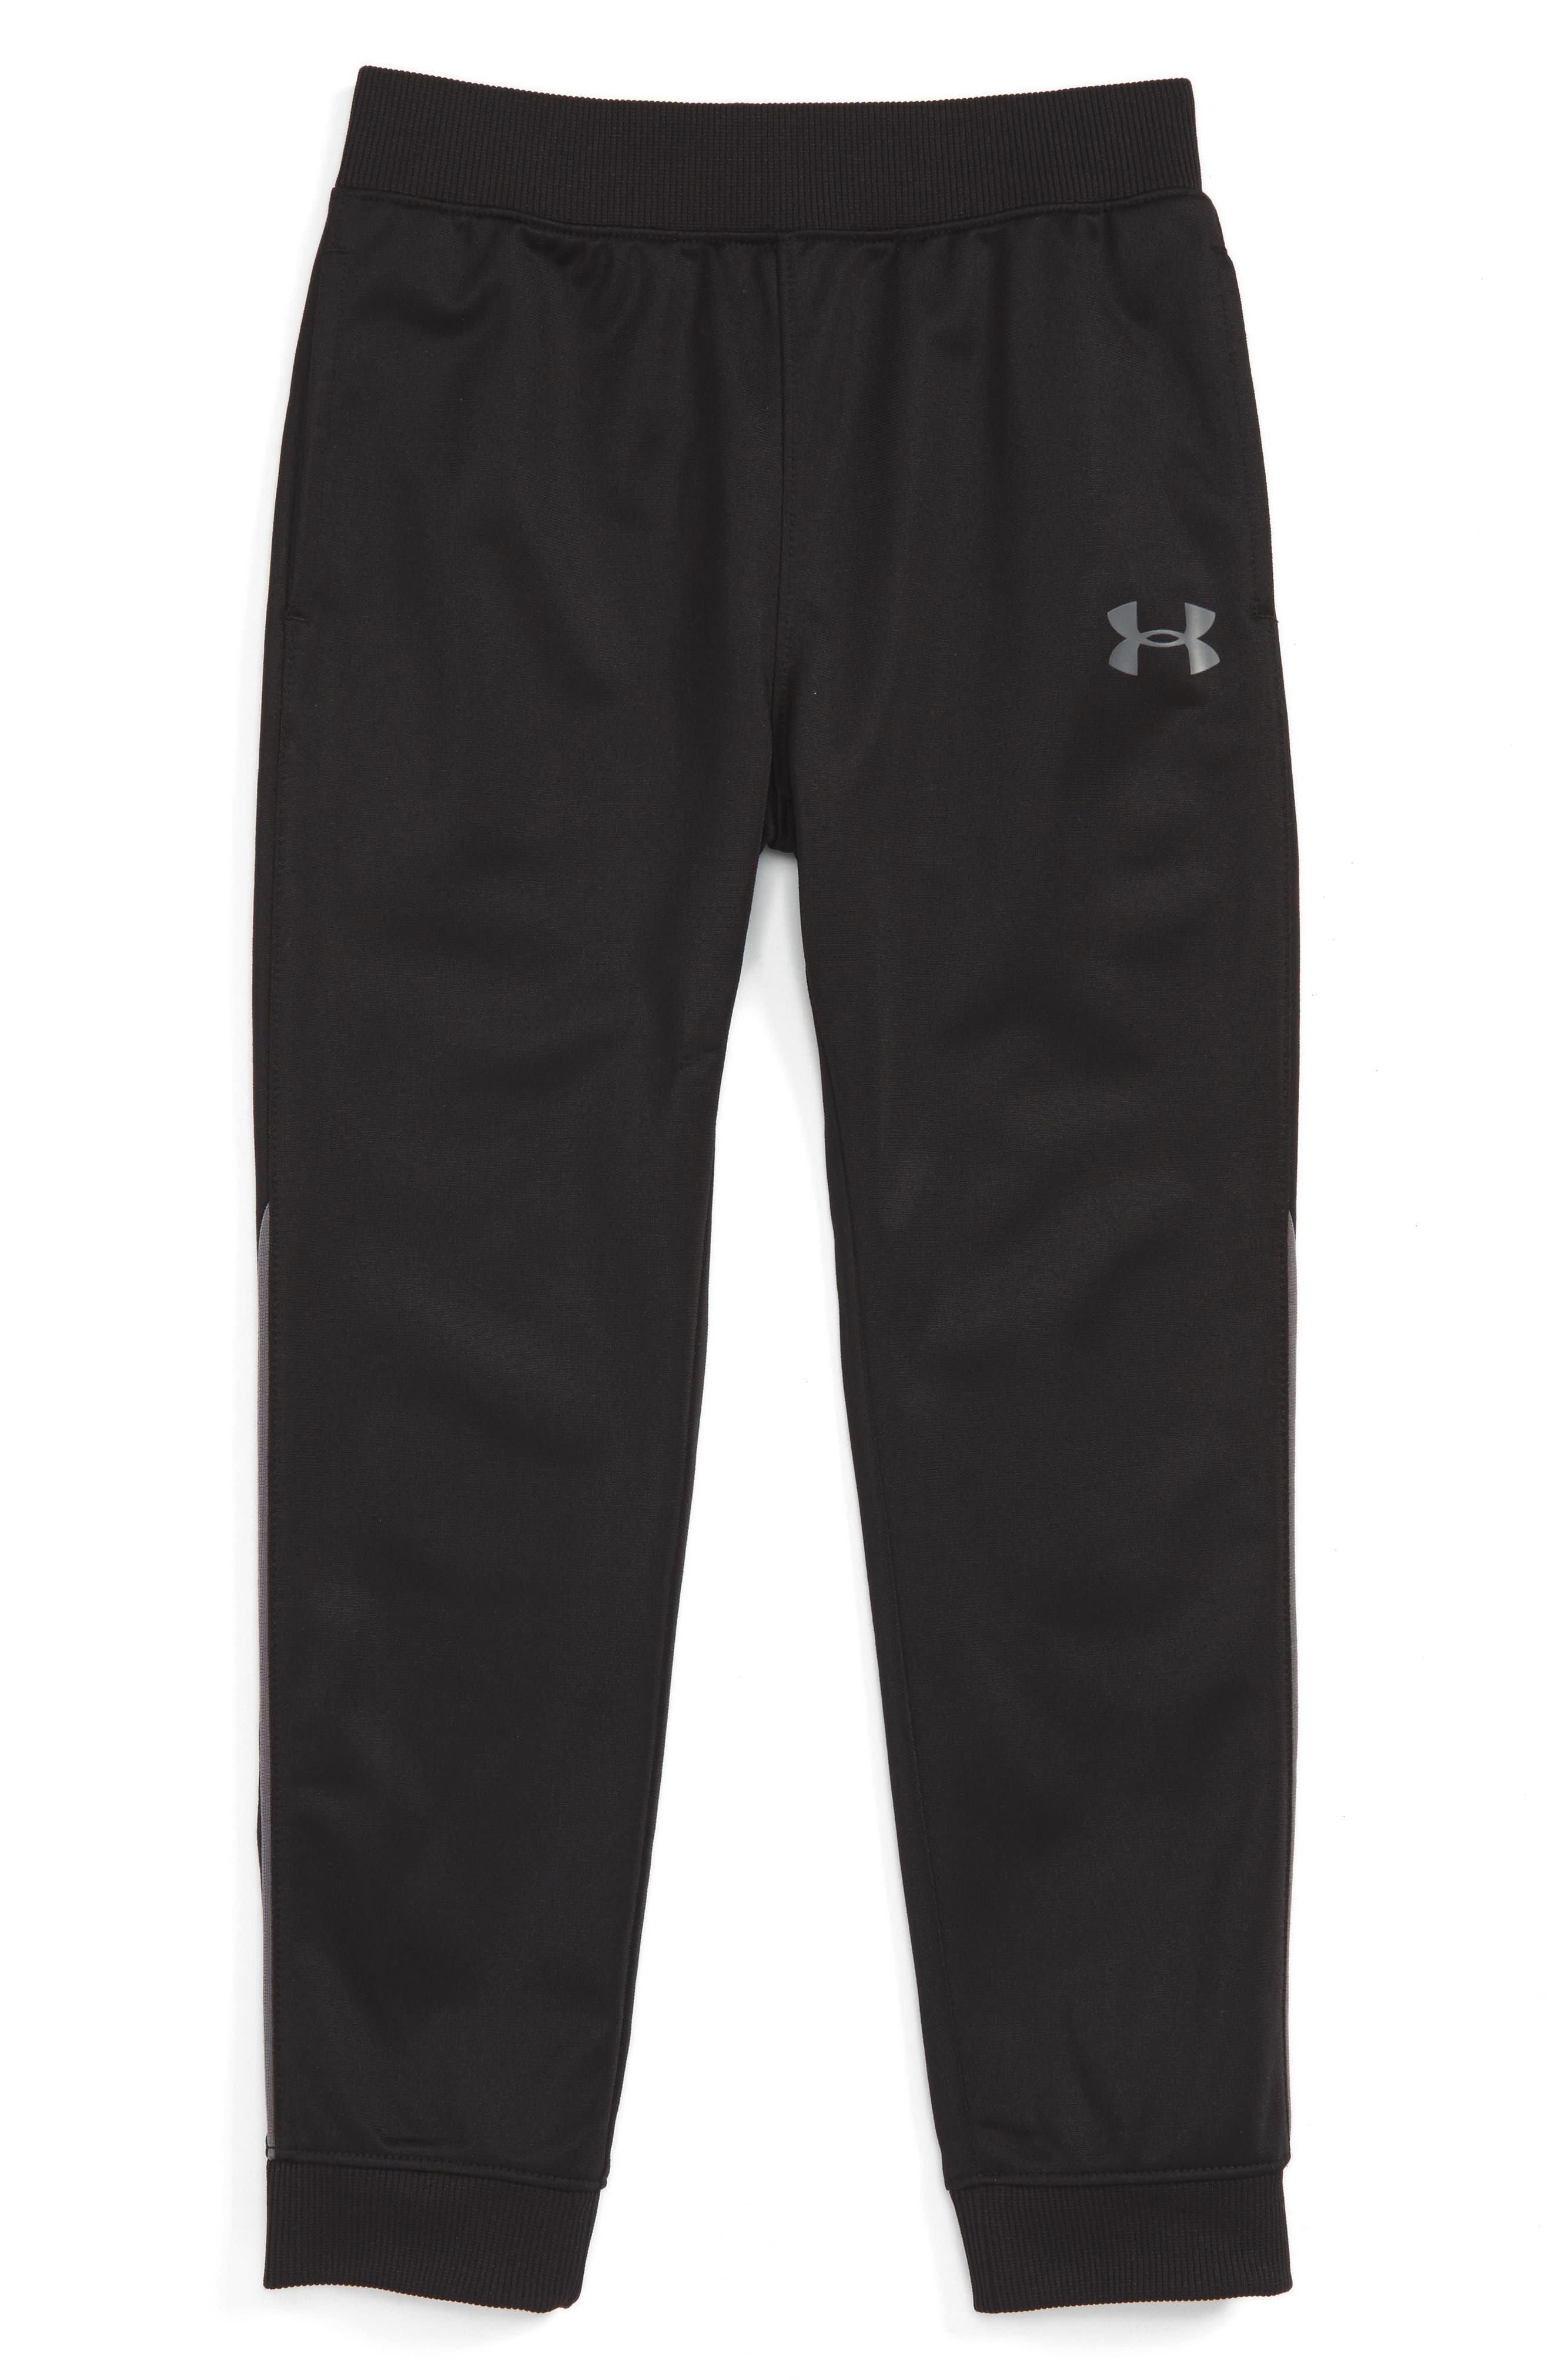 Pennant Sweatpants,                             Main thumbnail 1, color,                             Black/ Graphite